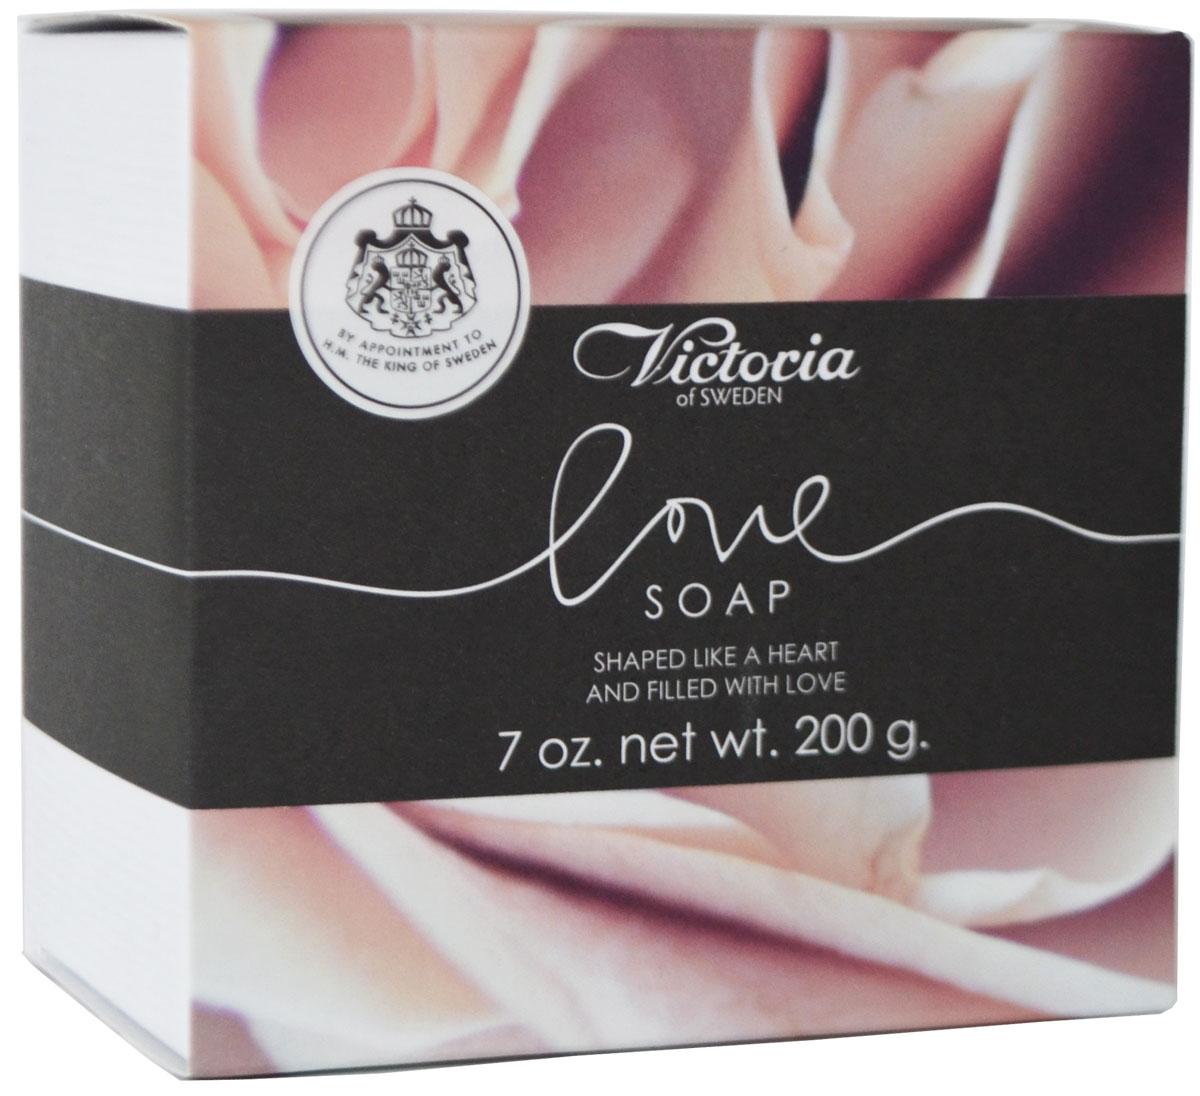 Victoria Soap Мыло для тела Love Soap Night, 200 г мыло для тела victoria soap мыло для тела